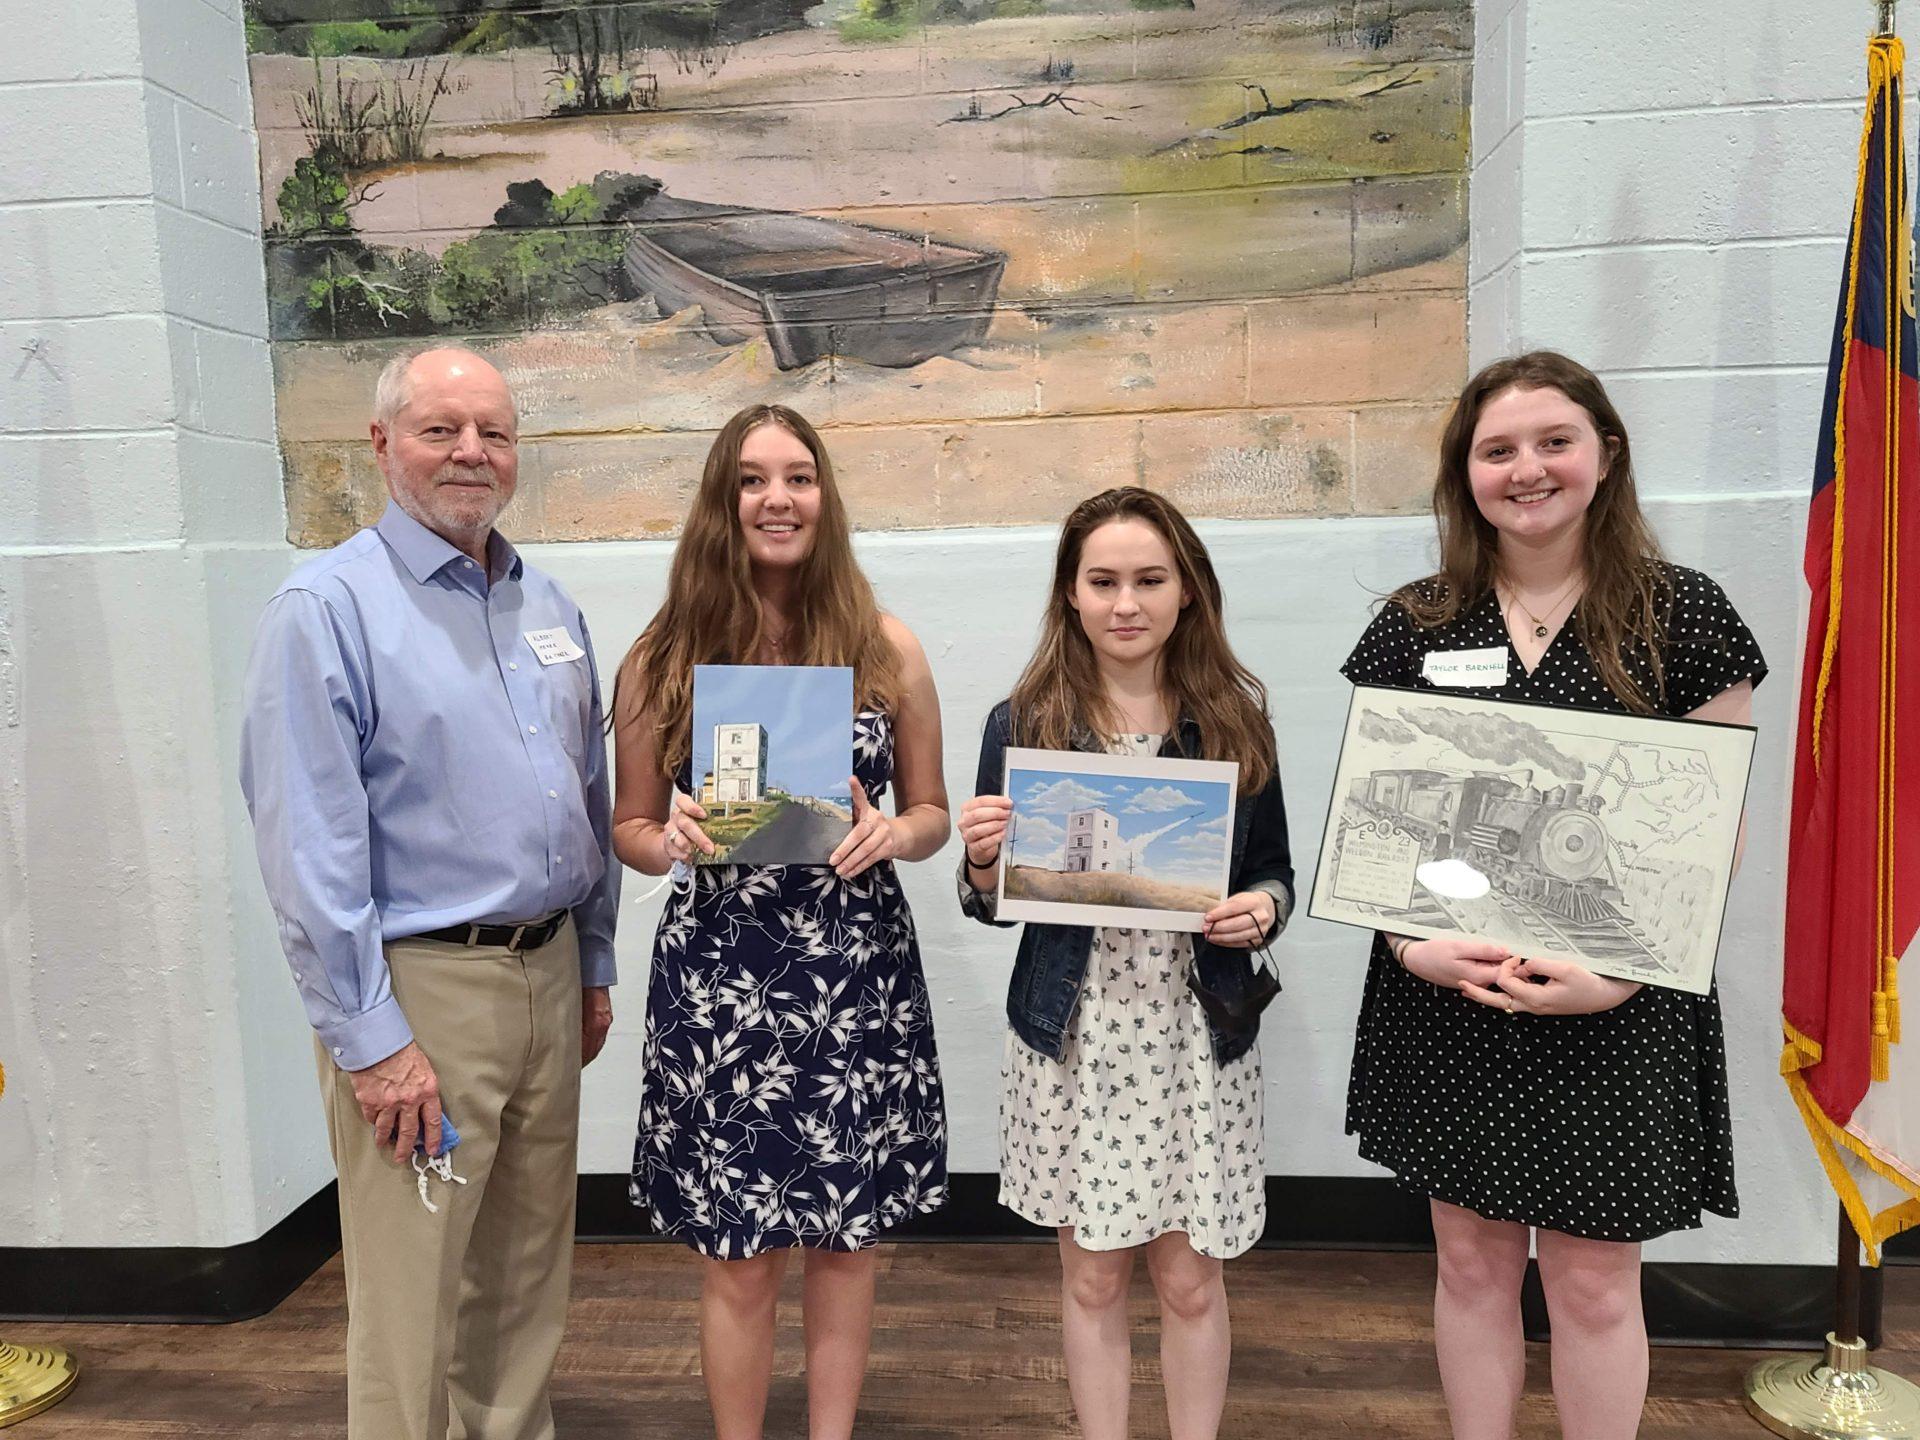 2021-04-08 HSTI Scholarship Winners with Chairman